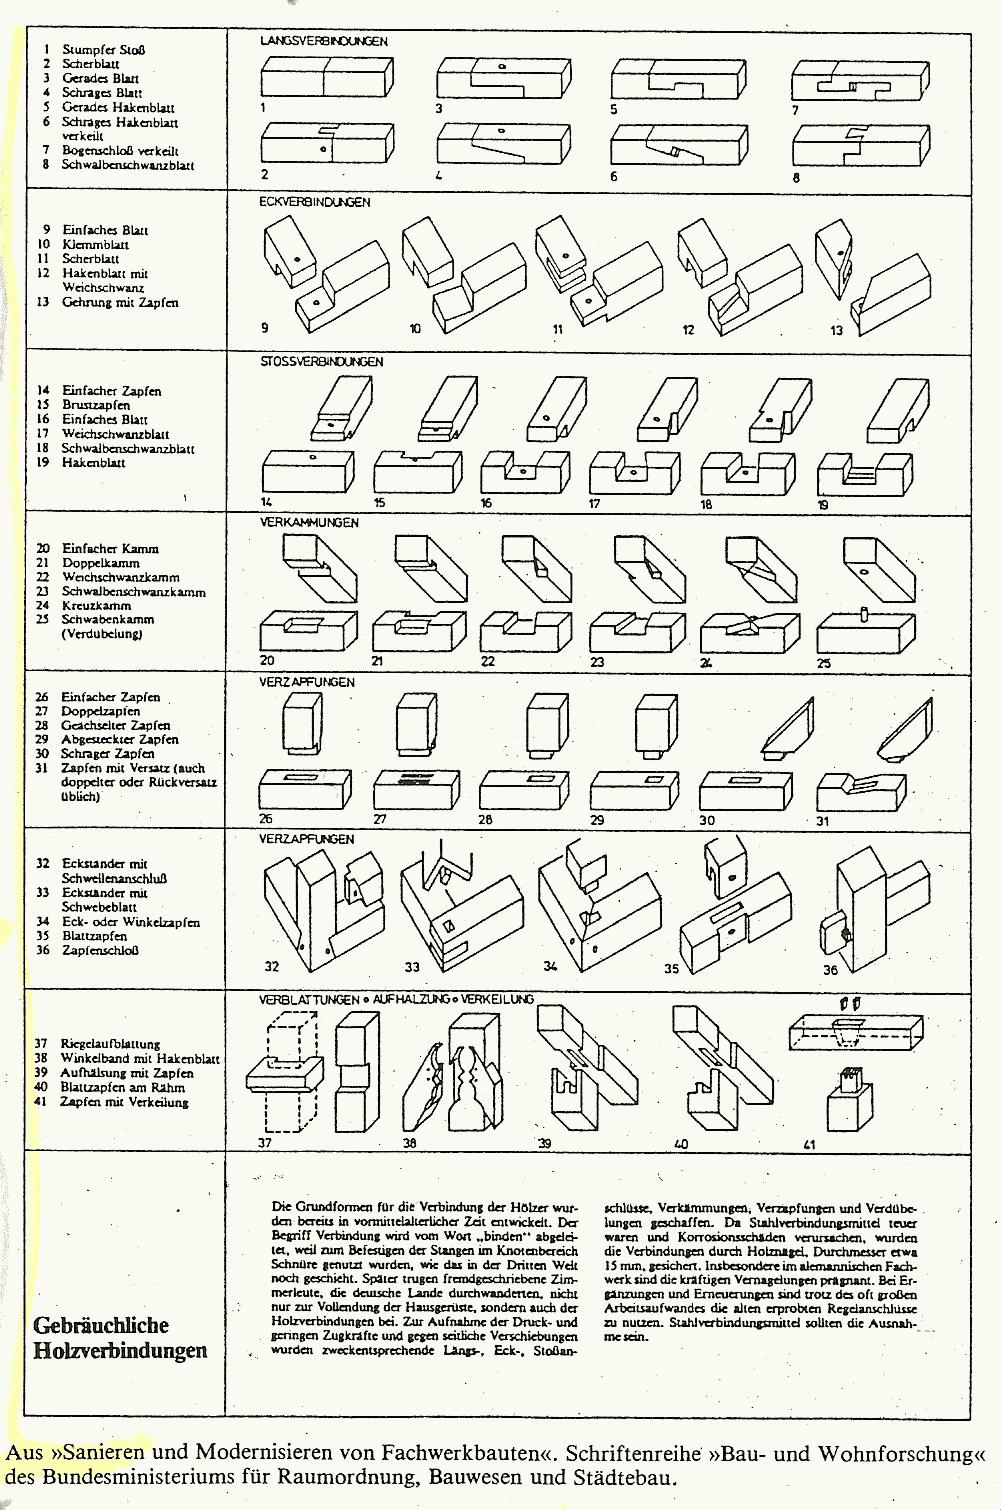 Holzverbindungen for Holzverbindungen fachwerk